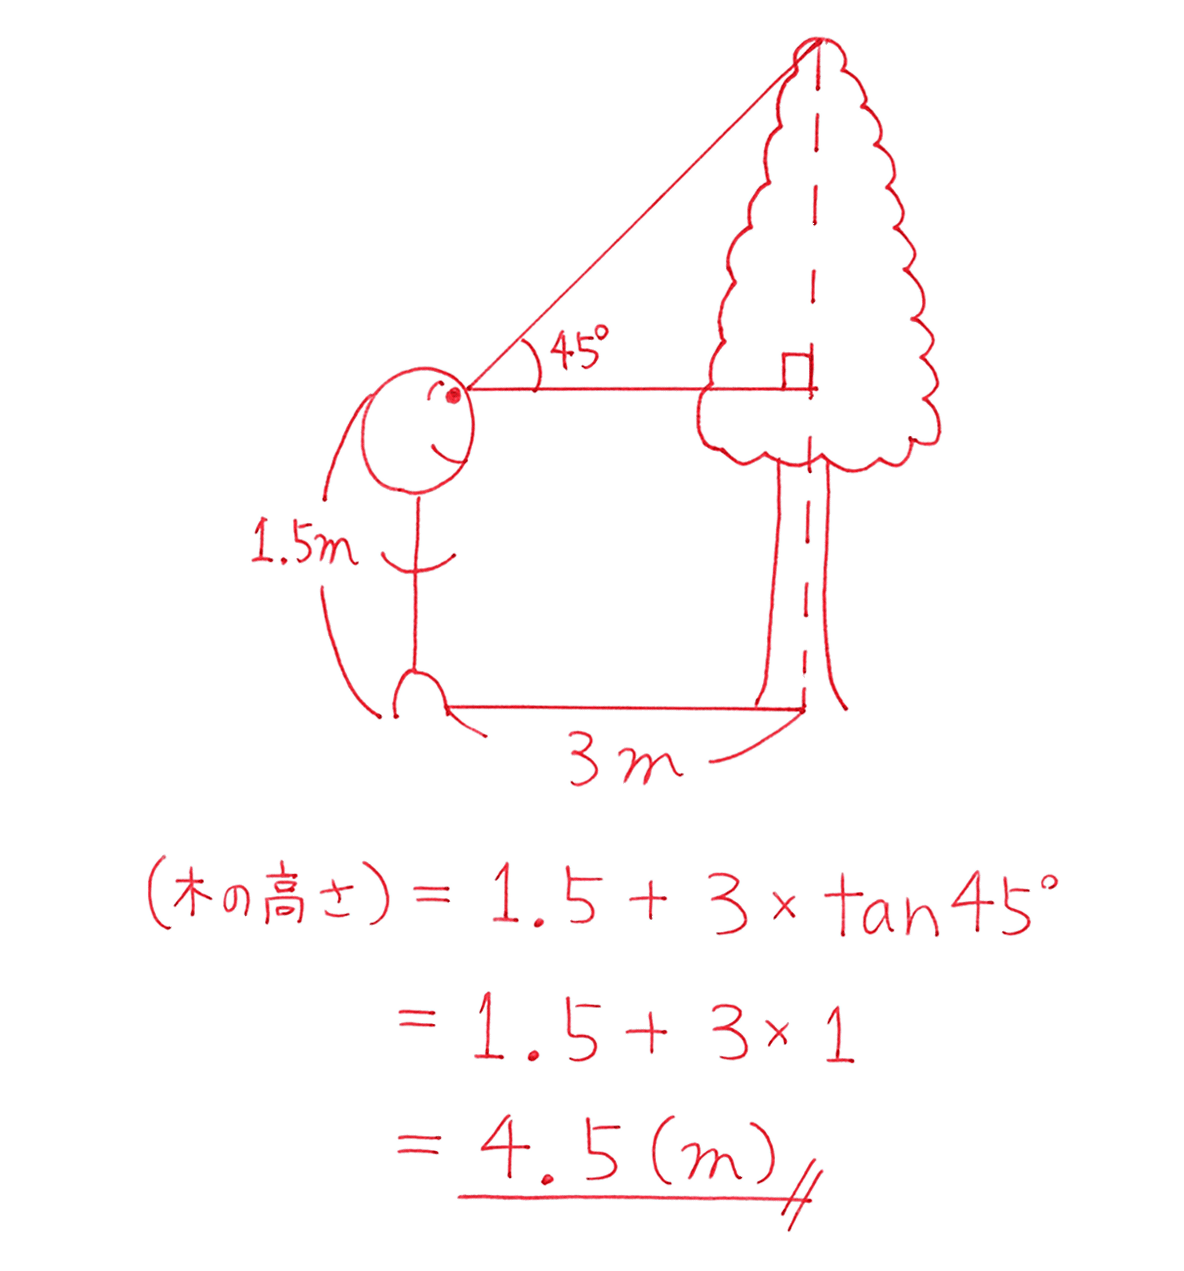 高校数学Ⅰ 三角比7 練習の答え